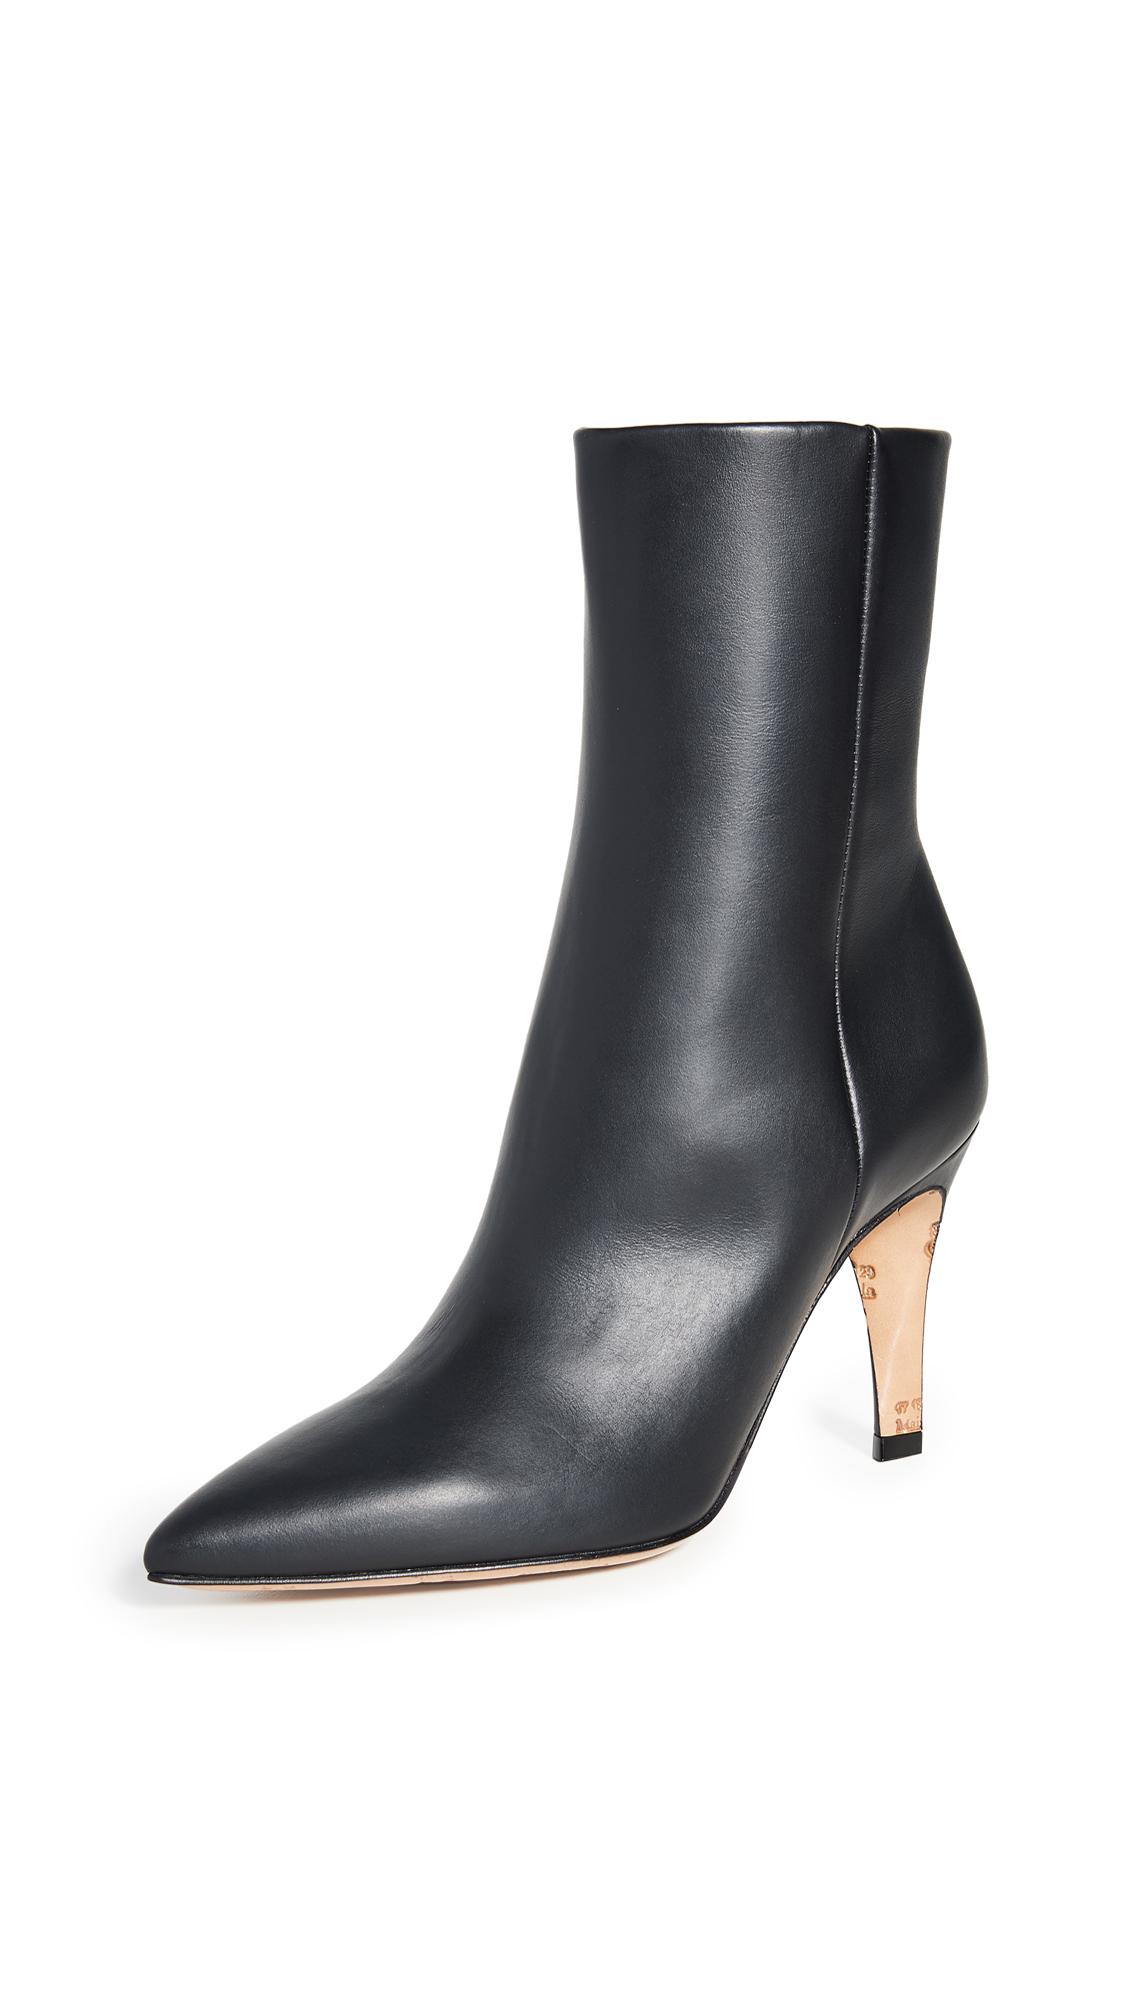 Buy Maison Margiela online - photo of Maison Margiela Carved Heel Booties